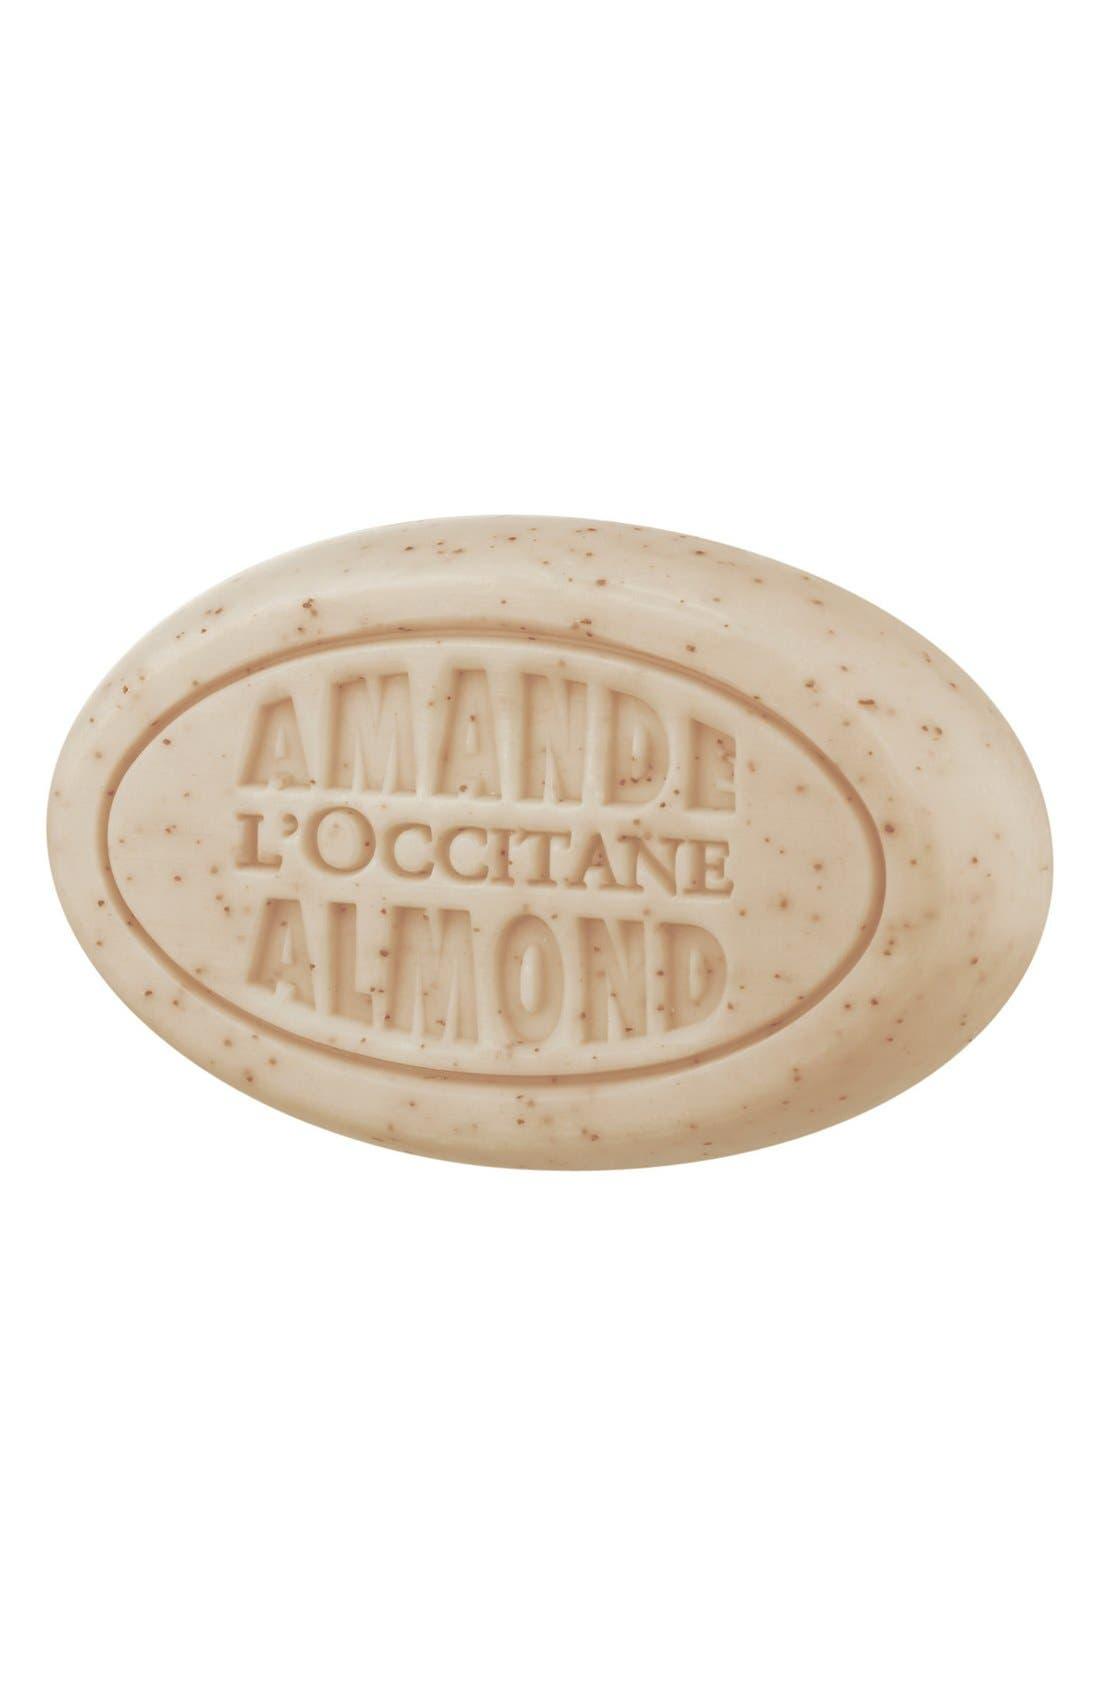 'Almond Delicious' Soap,                             Main thumbnail 1, color,                             NO COLOR